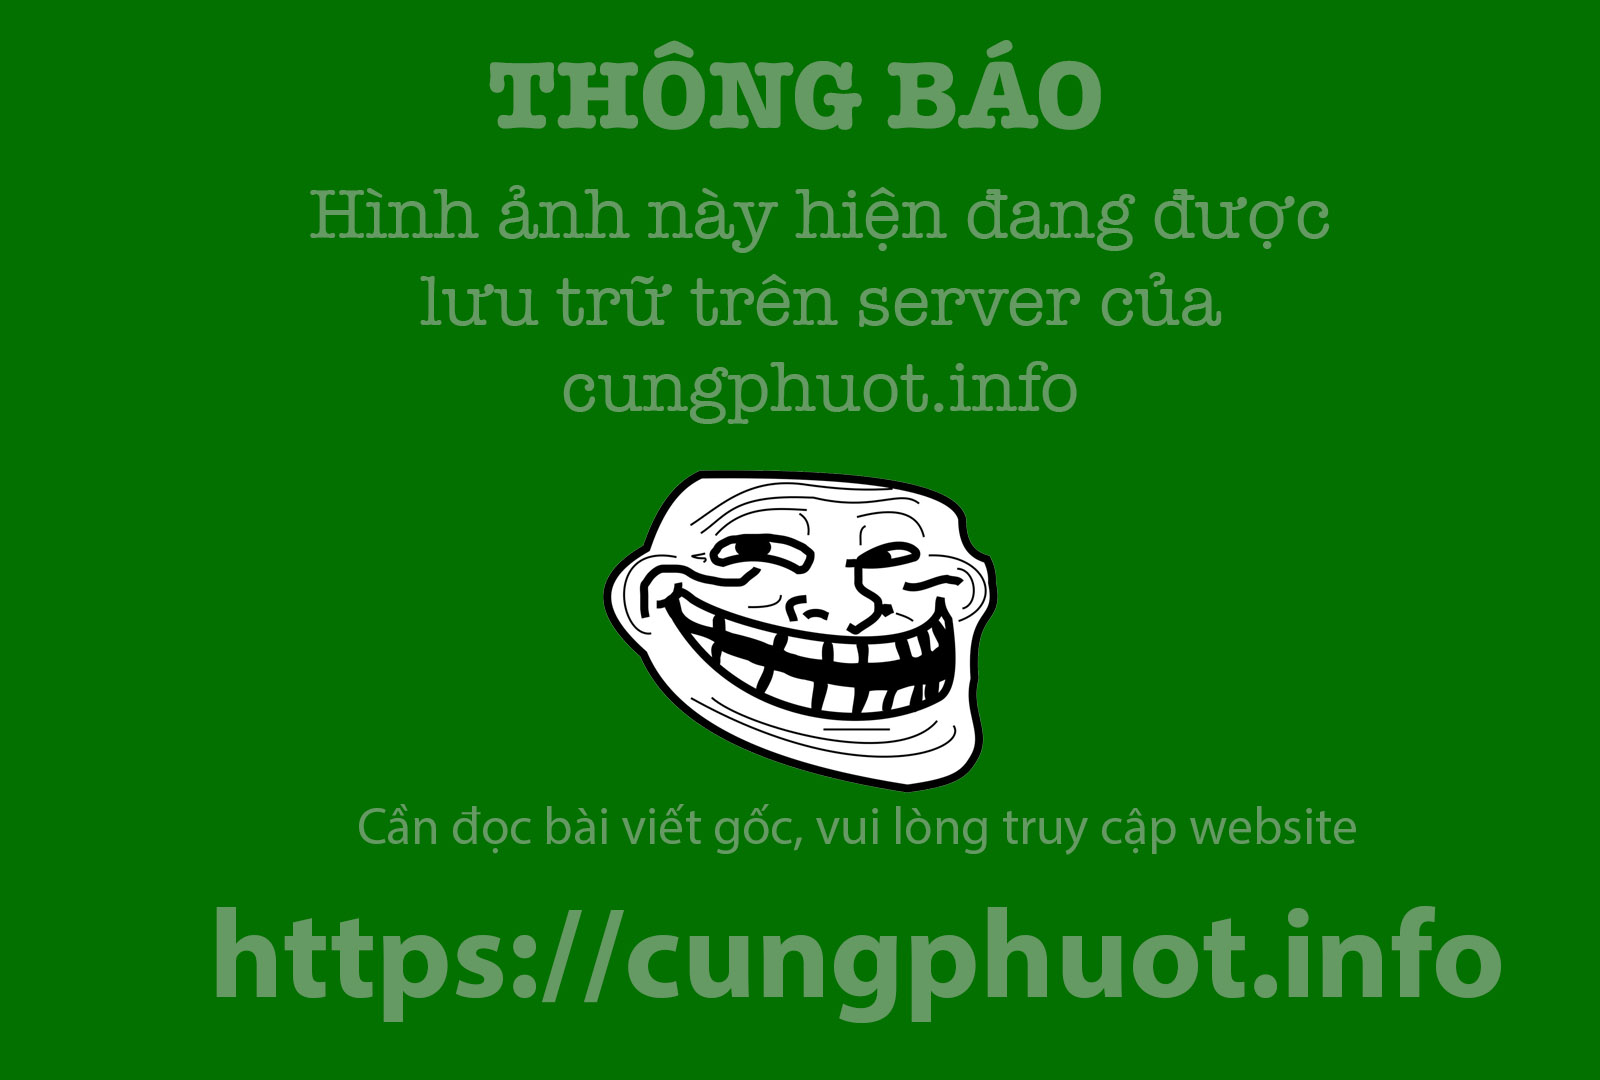 Den Moc Chau san mai anh dao hinh anh 2